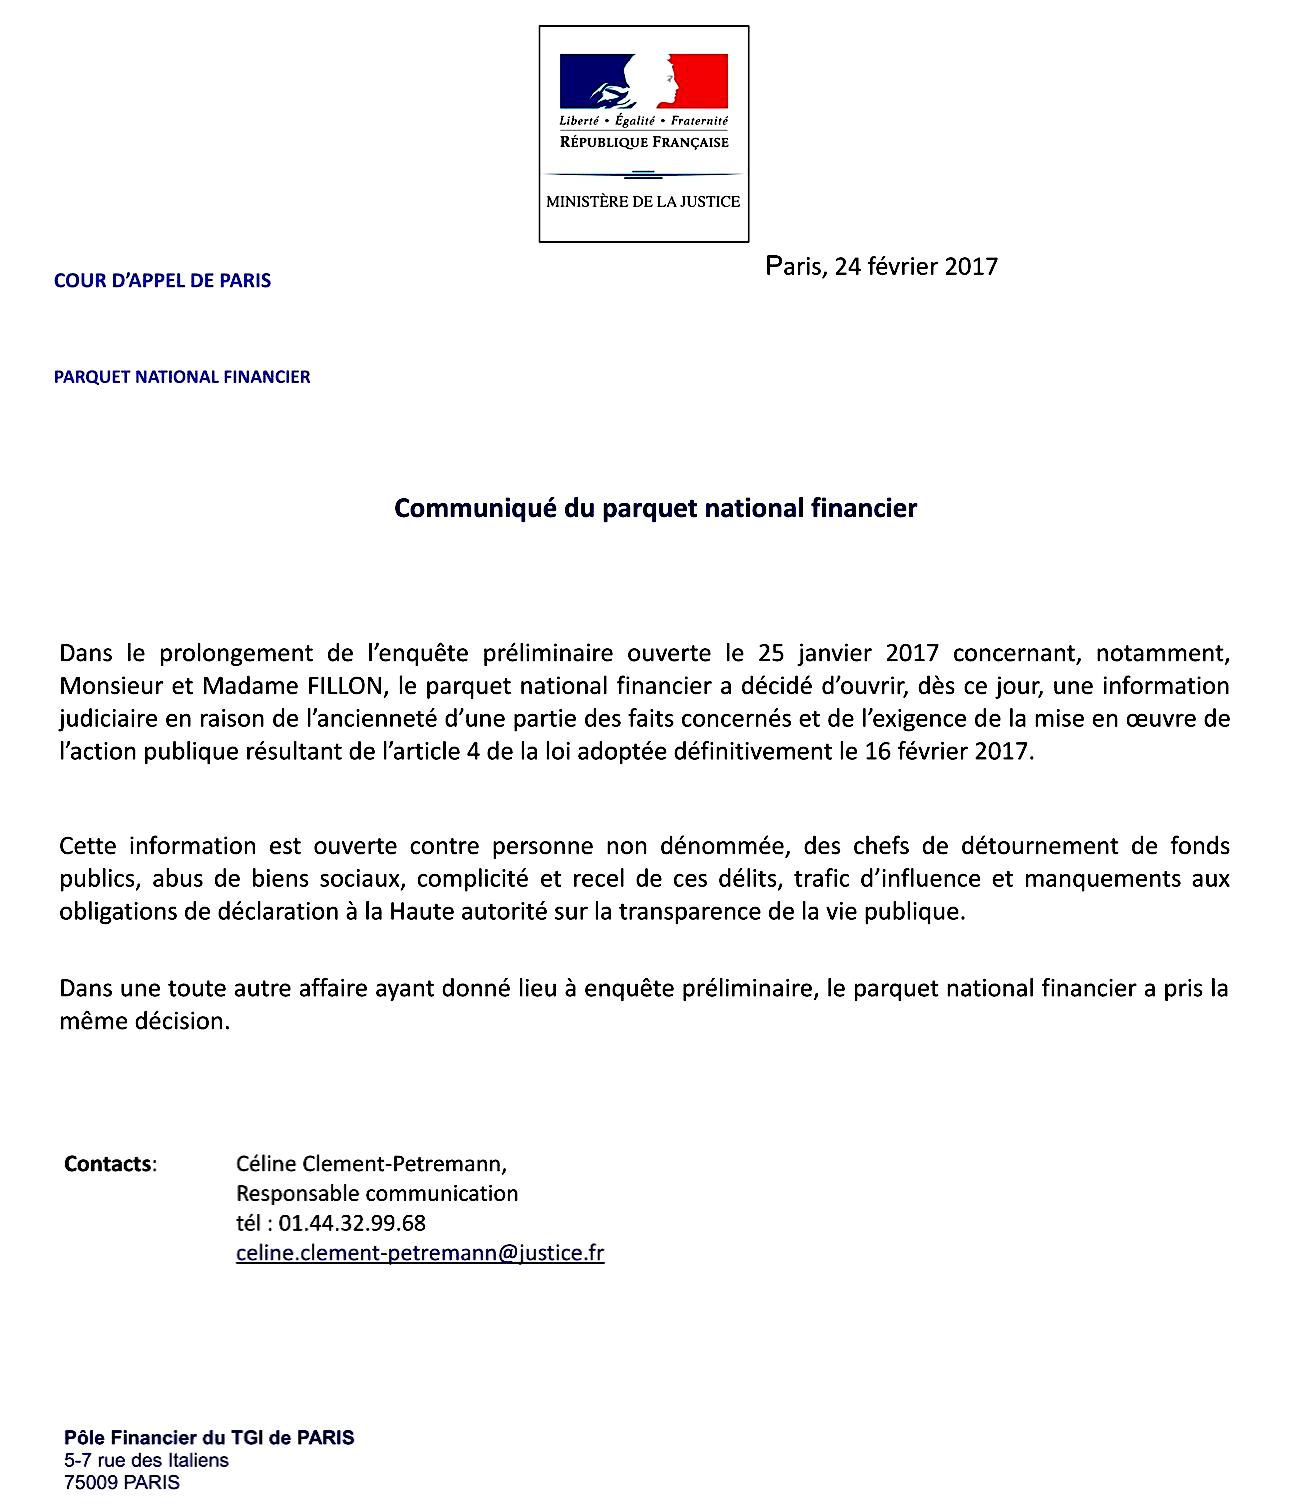 affairefillon-parquet-nf-instruction-judiciare-acte